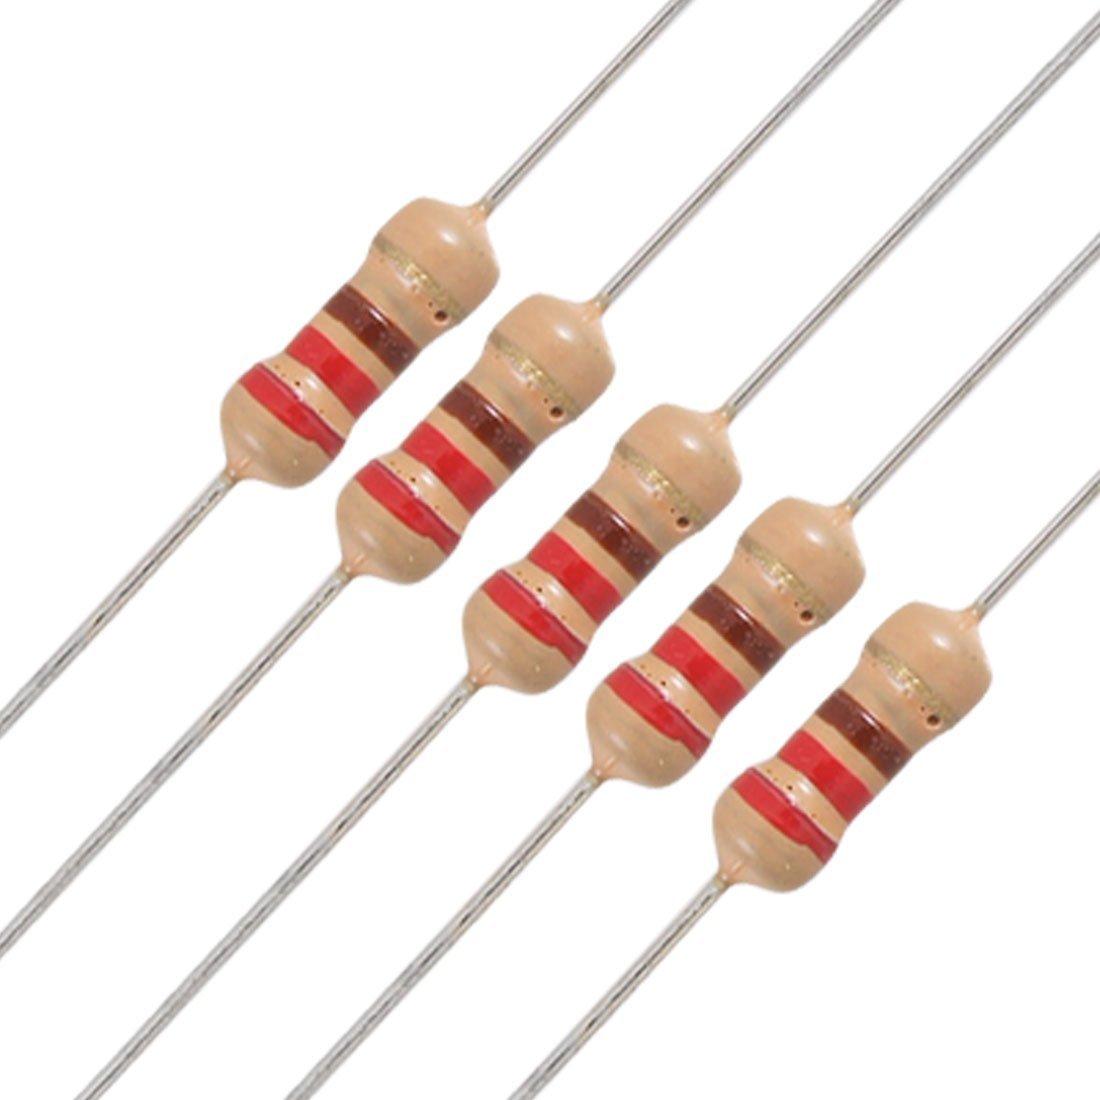 Tiamu 50x Resistor de pelicula de carbono de agujero pasante 220 Ohm 1//4W 5/%